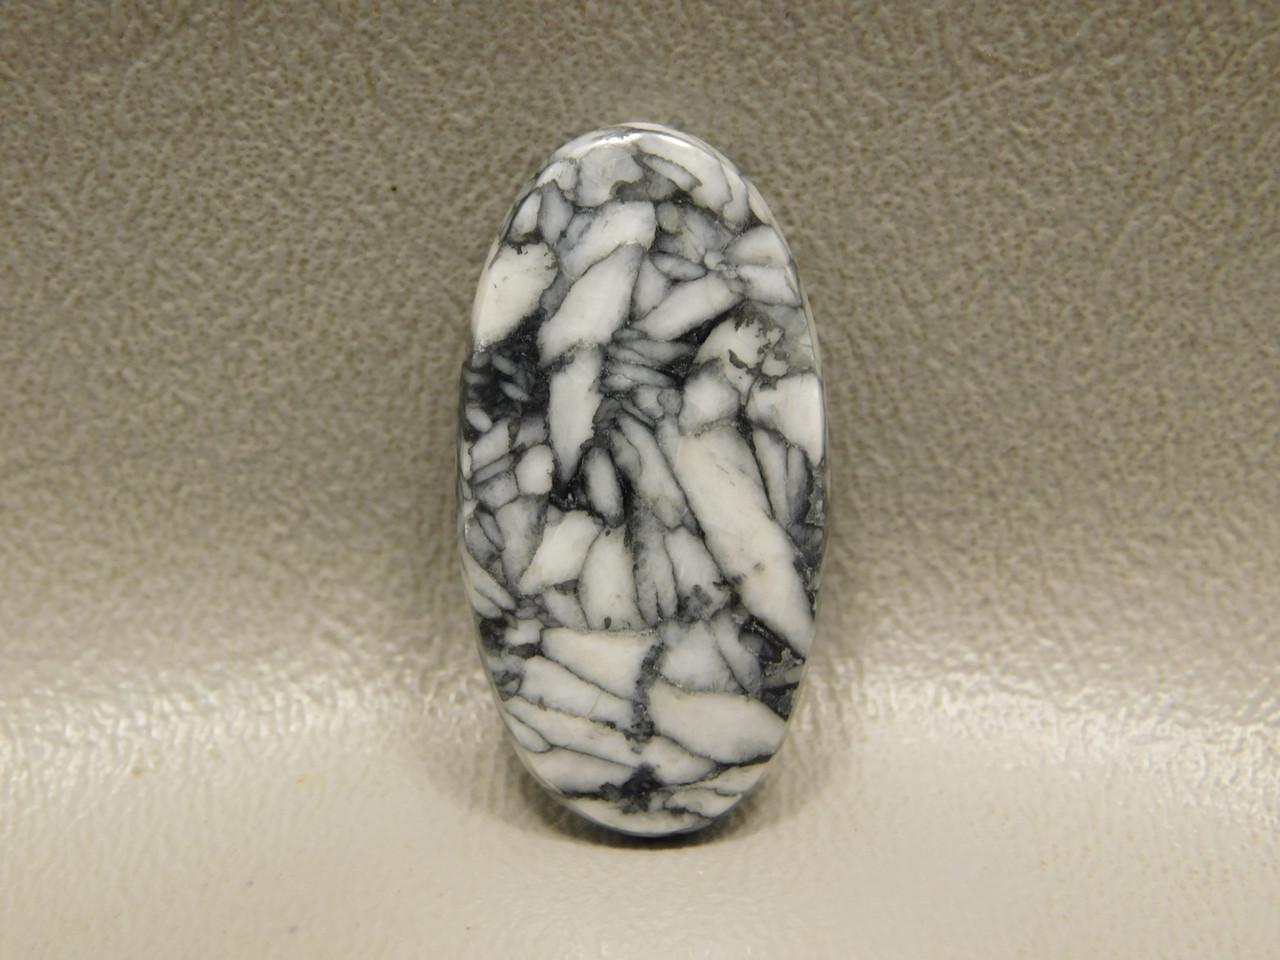 Pinolith or Pinolite Loose Stone Jewelry Cabochon #17